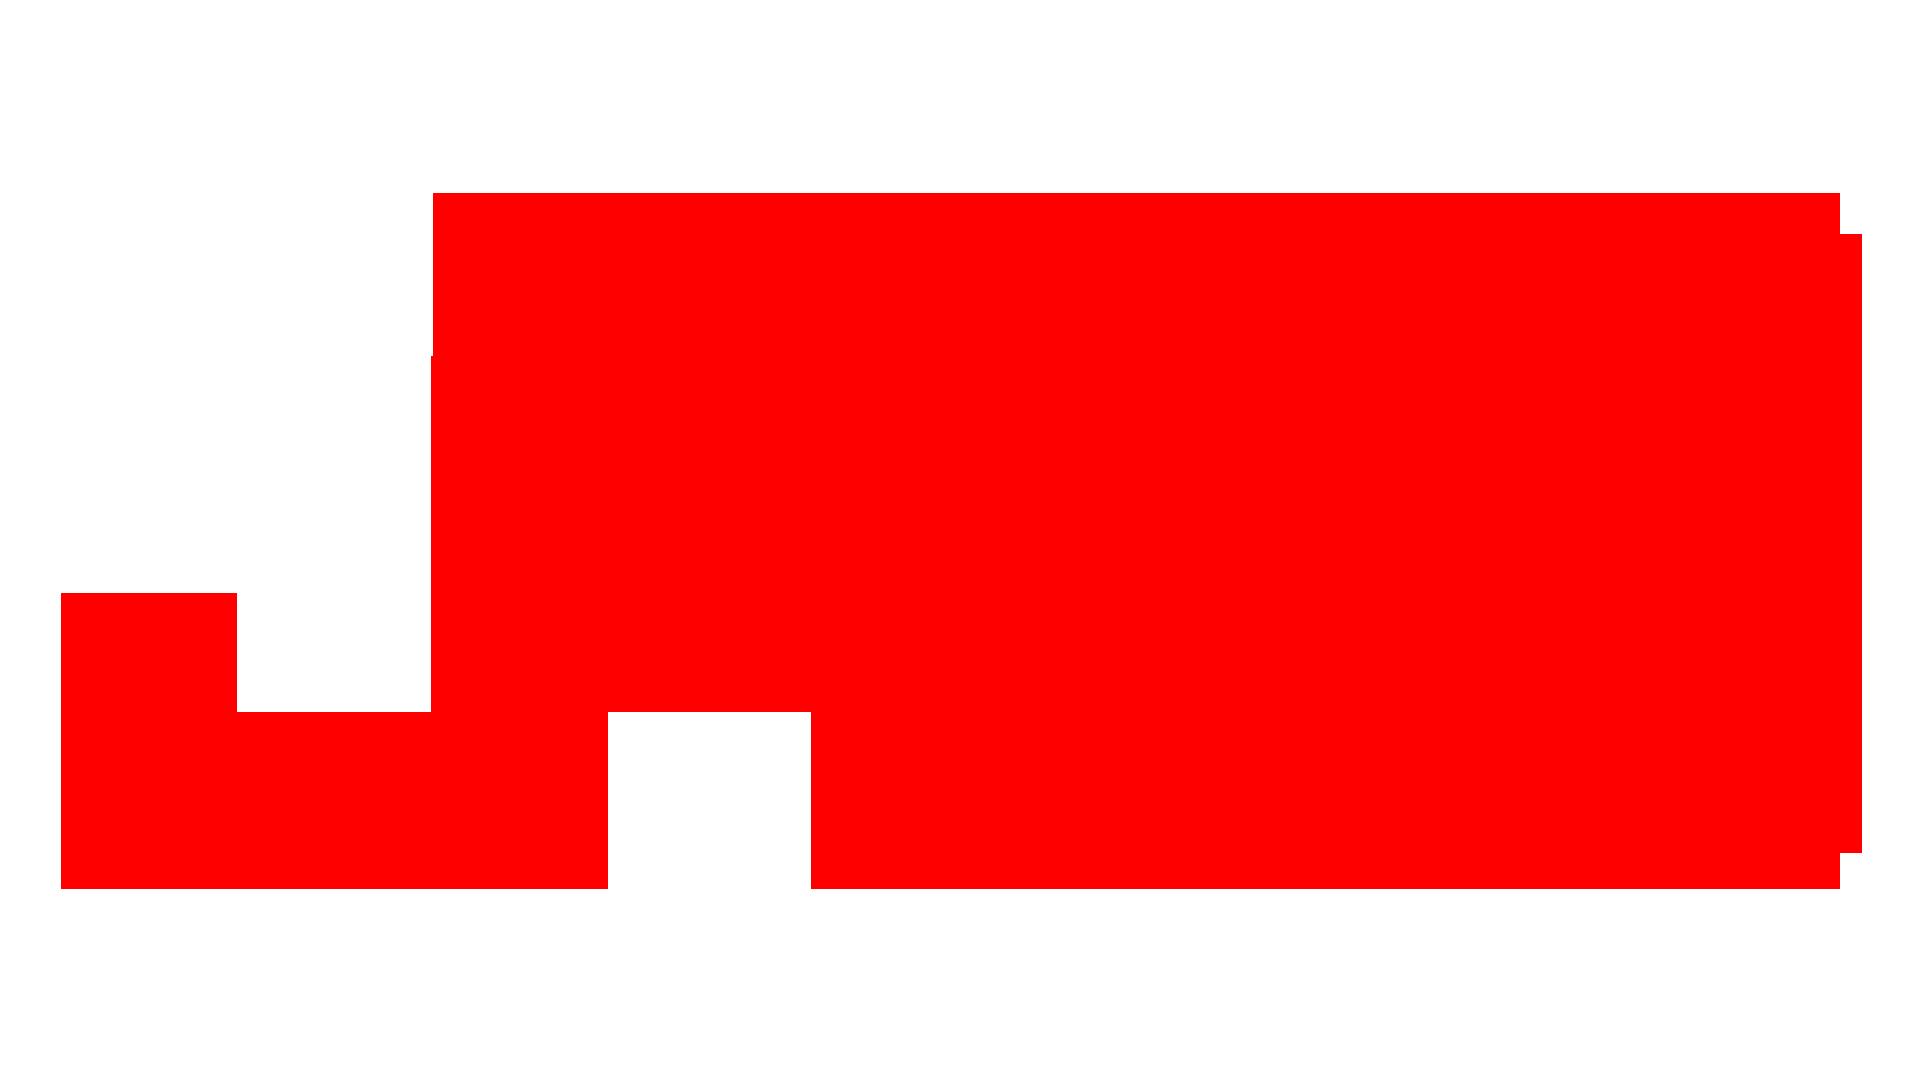 jvc logo jvc symbol meaning history and evolution rh 1000logos net  japanese multinational electronic company logos